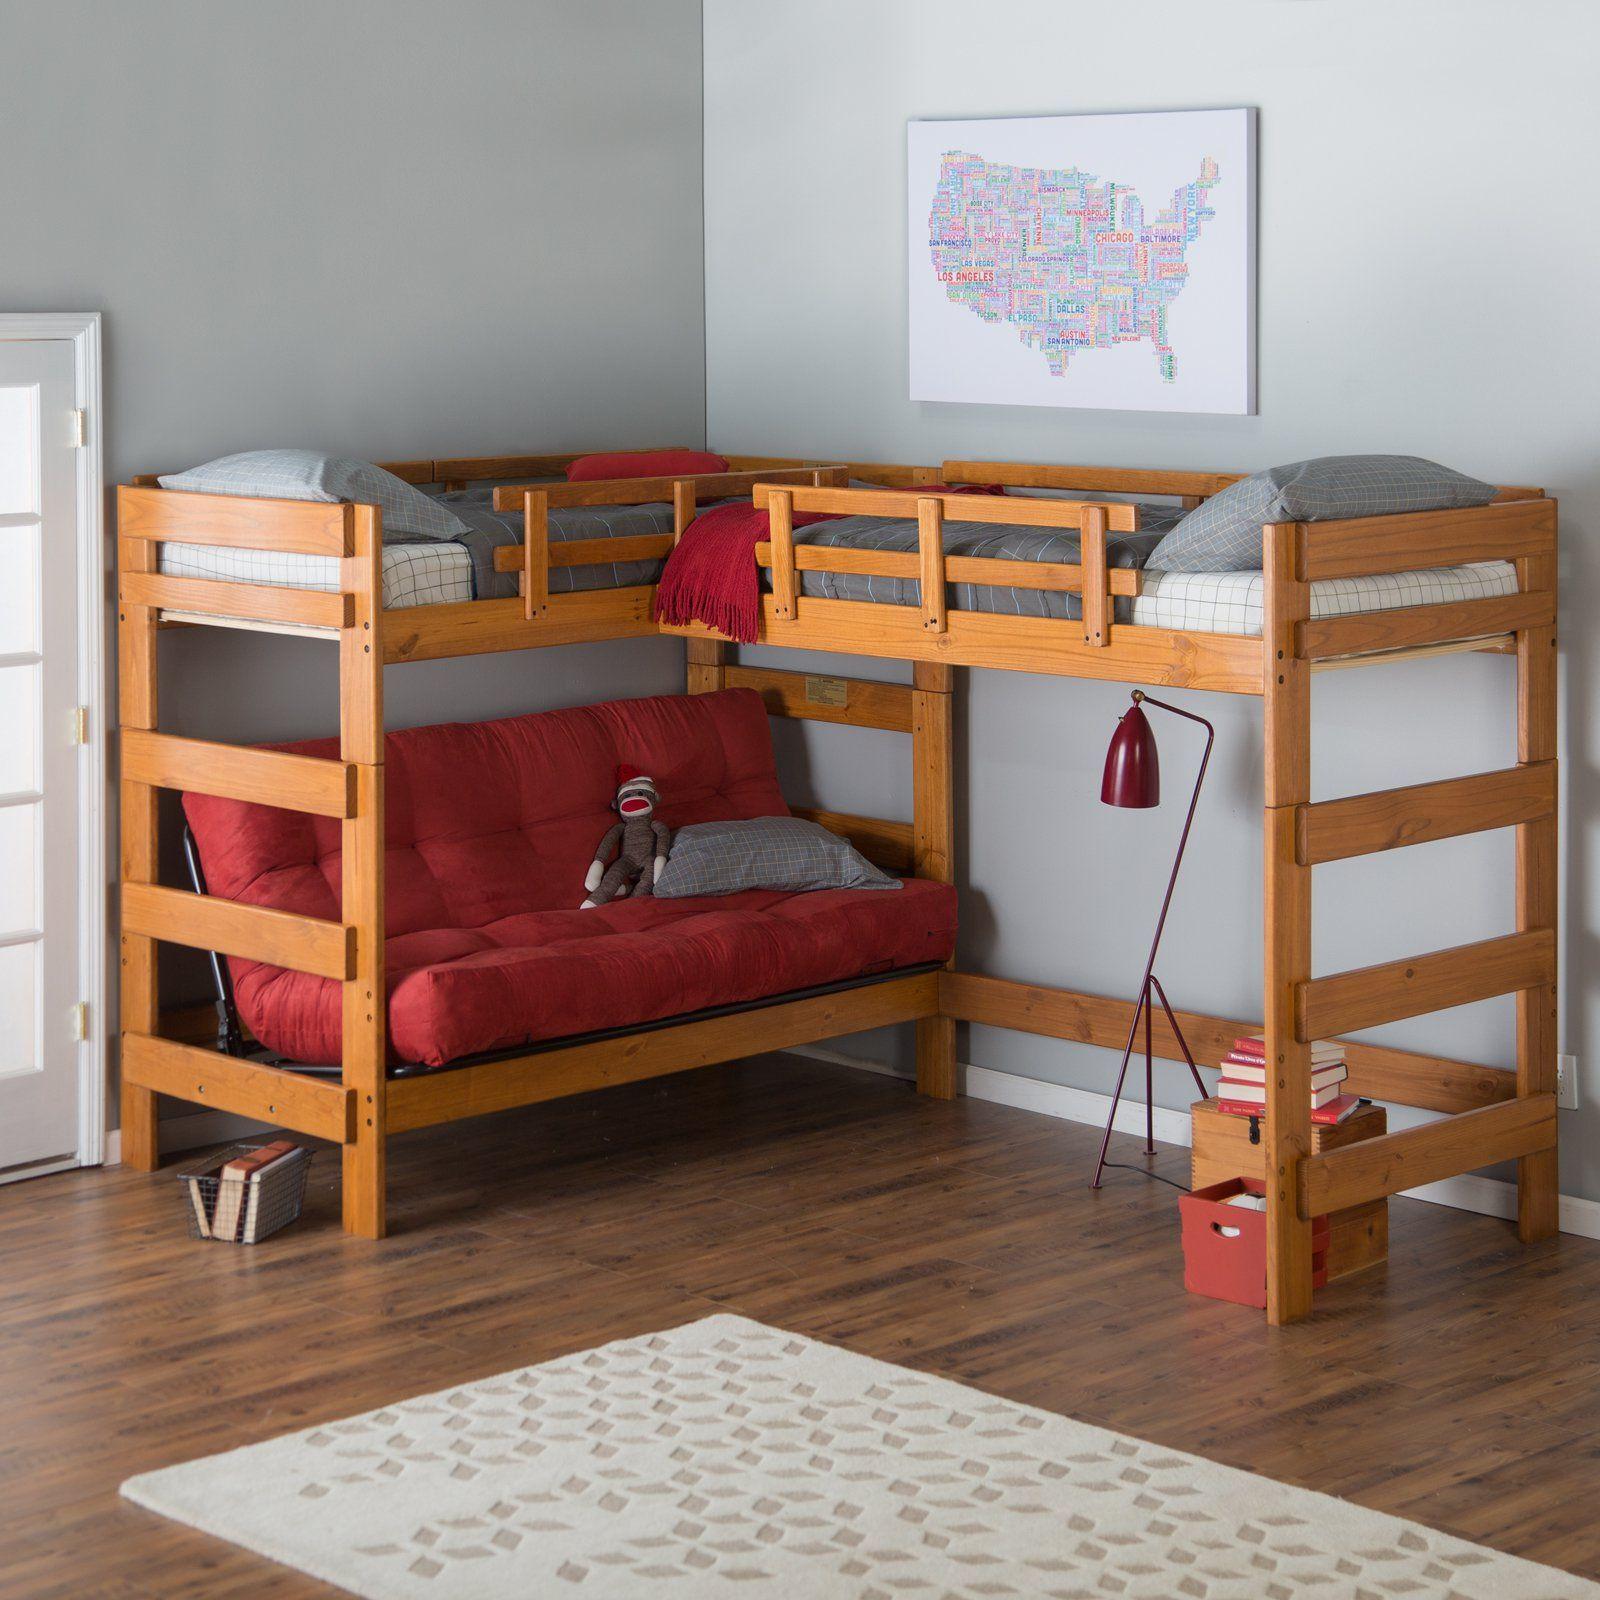 Bunk bed loft ideas   Bunk Beds Loft  Interior Design Bedroom Ideas Check more at